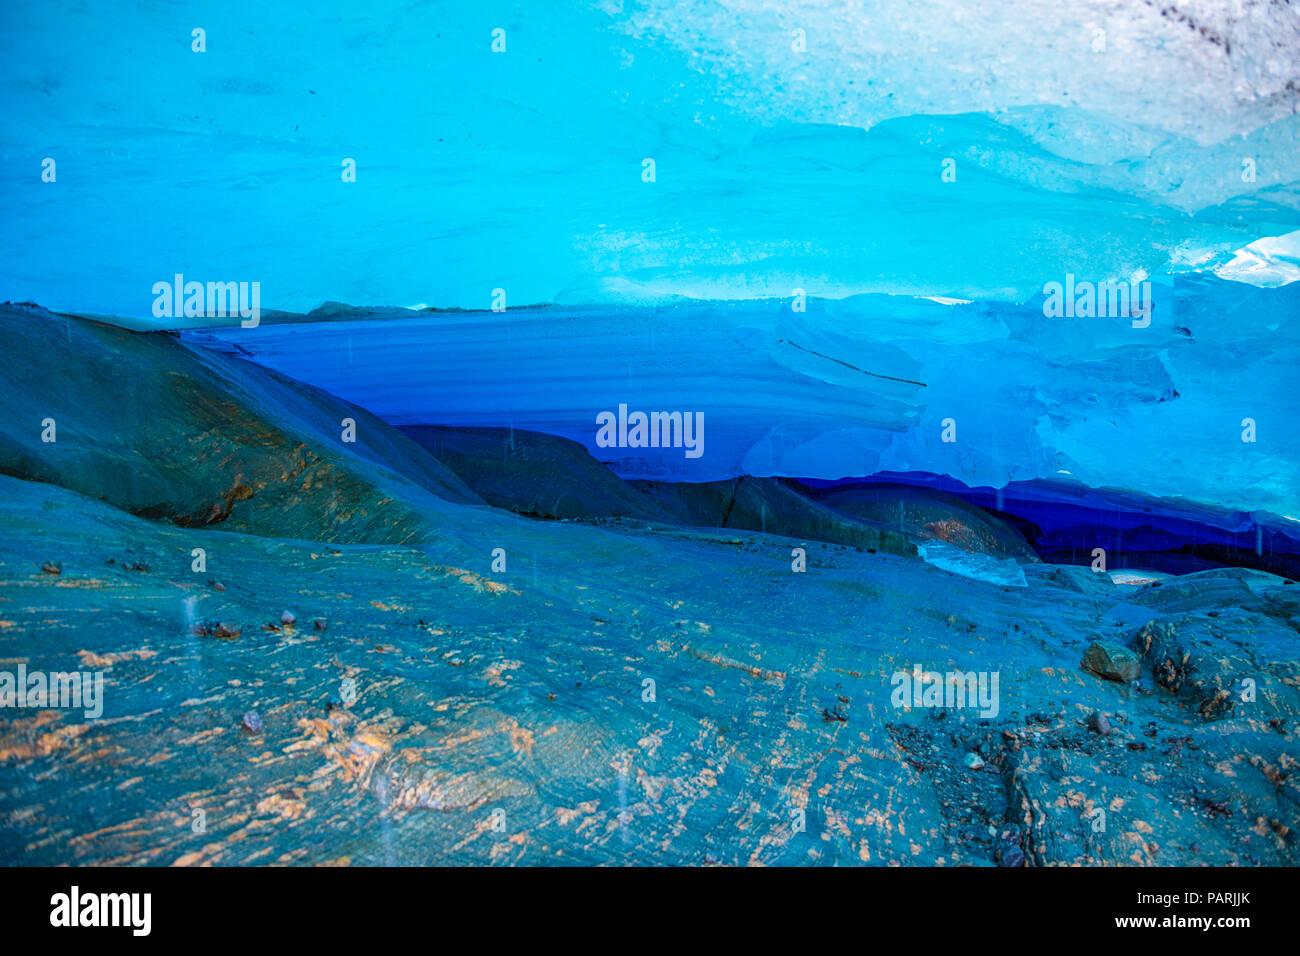 Blue ice cave of Svartisen Glacier, Norway - Stock Image